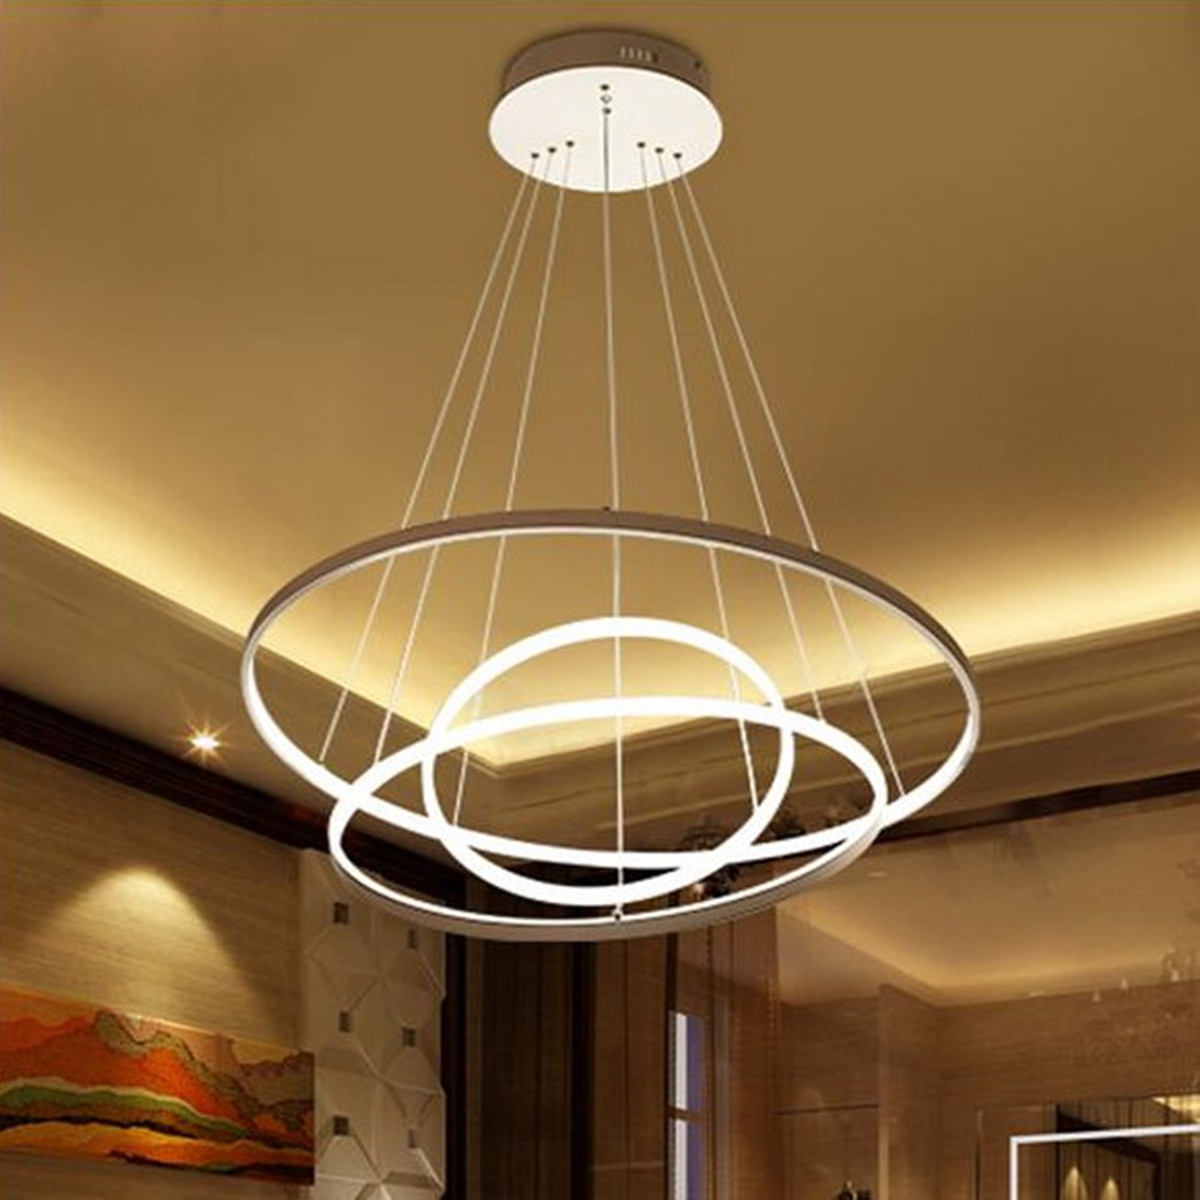 3 Circular Ring Ceiling Pendant Light Aluminum Led